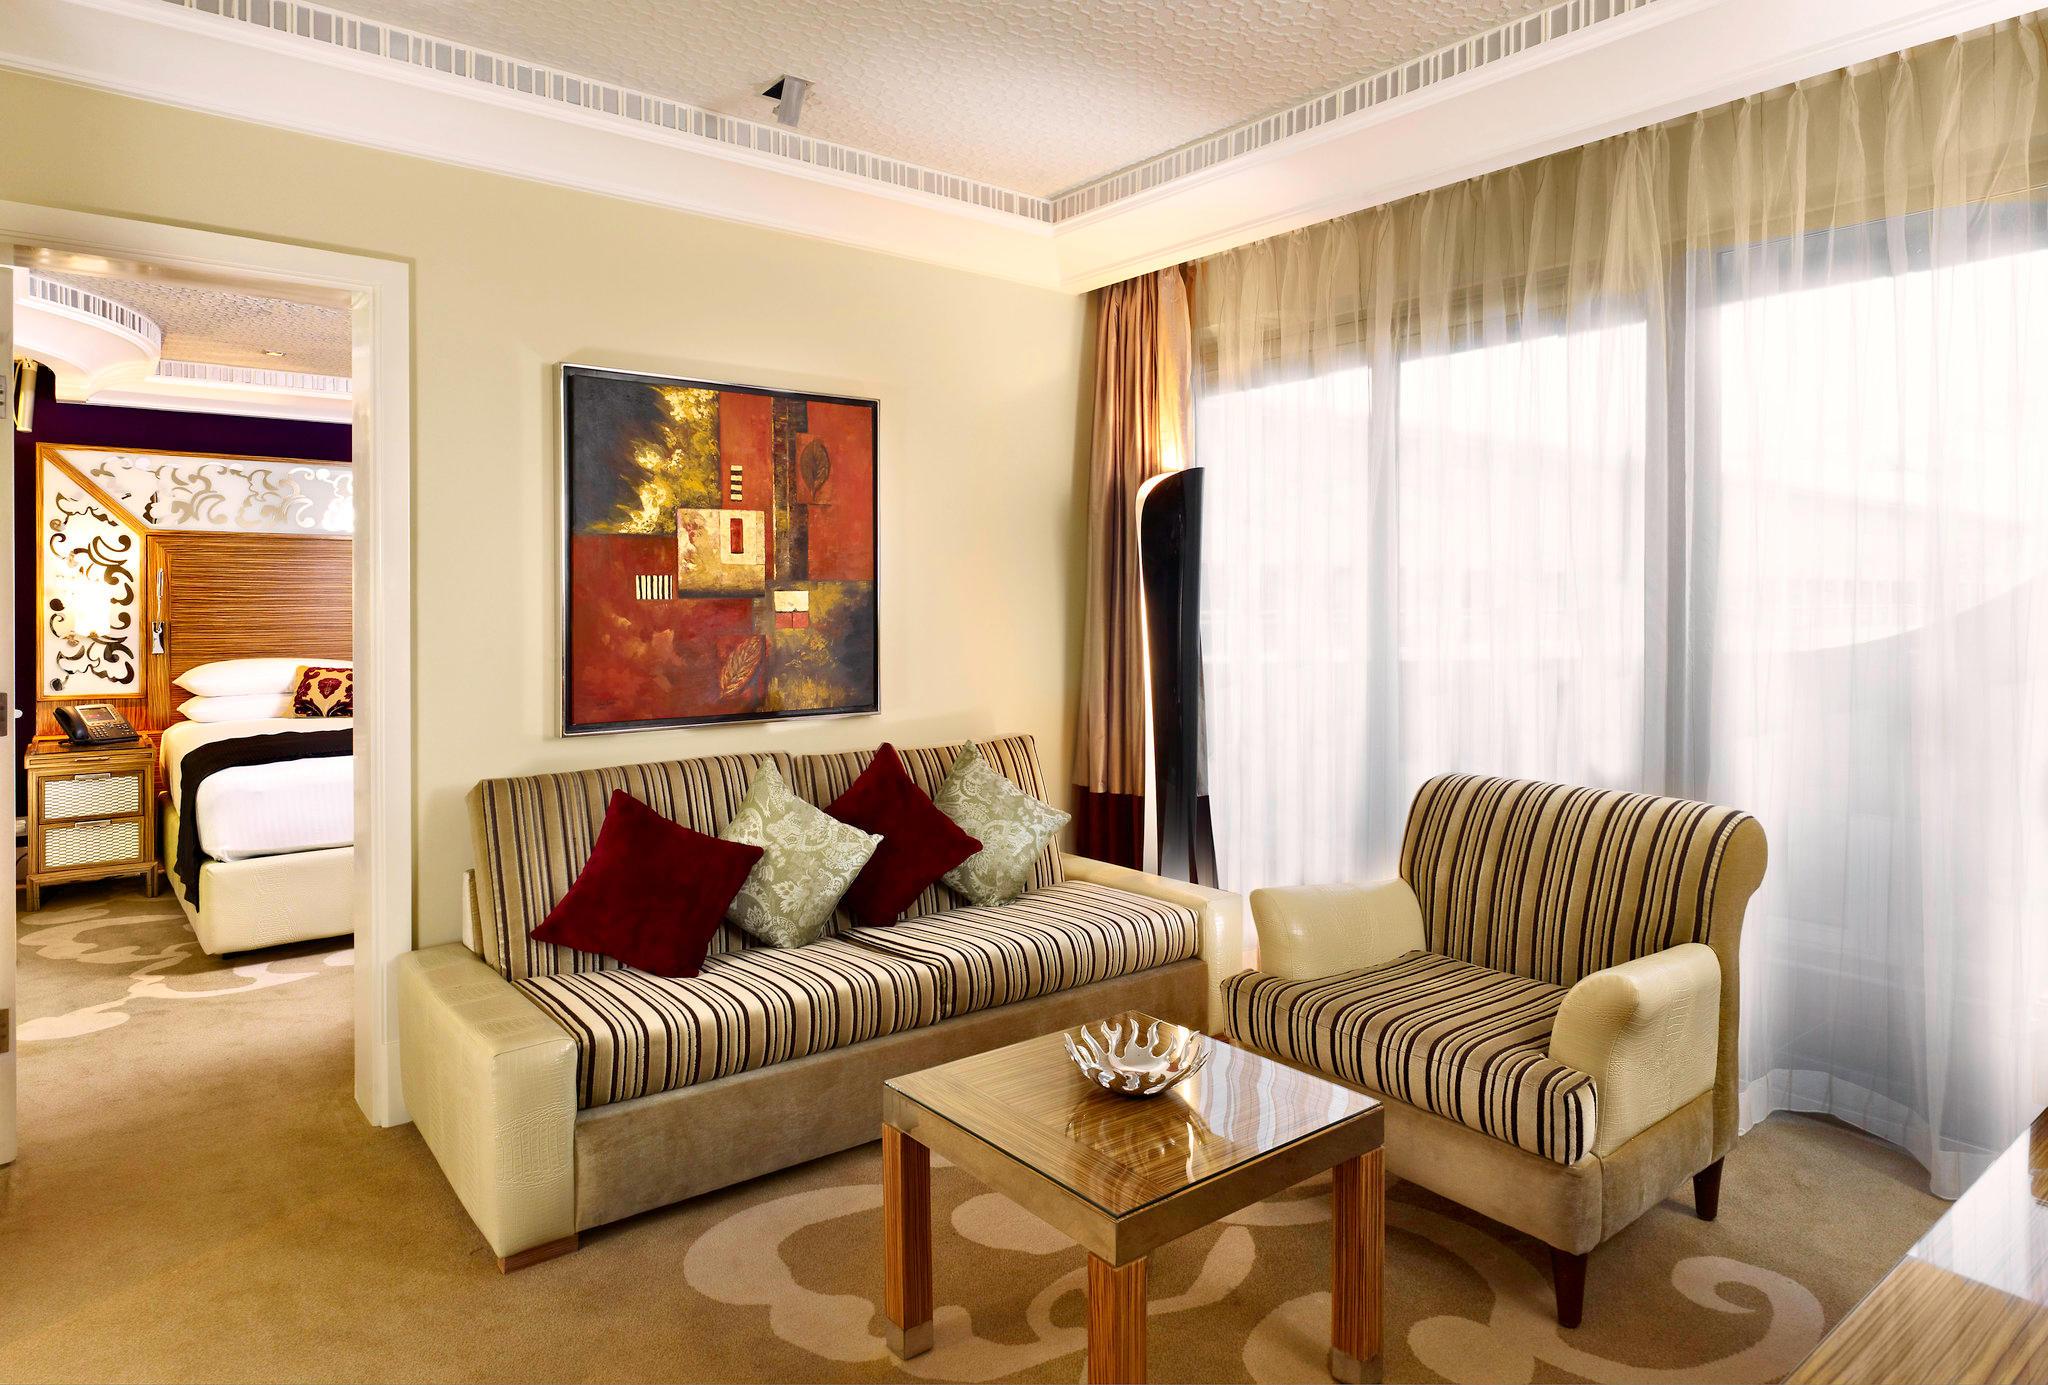 InterContinental Citystars Cairo, an IHG Hotel